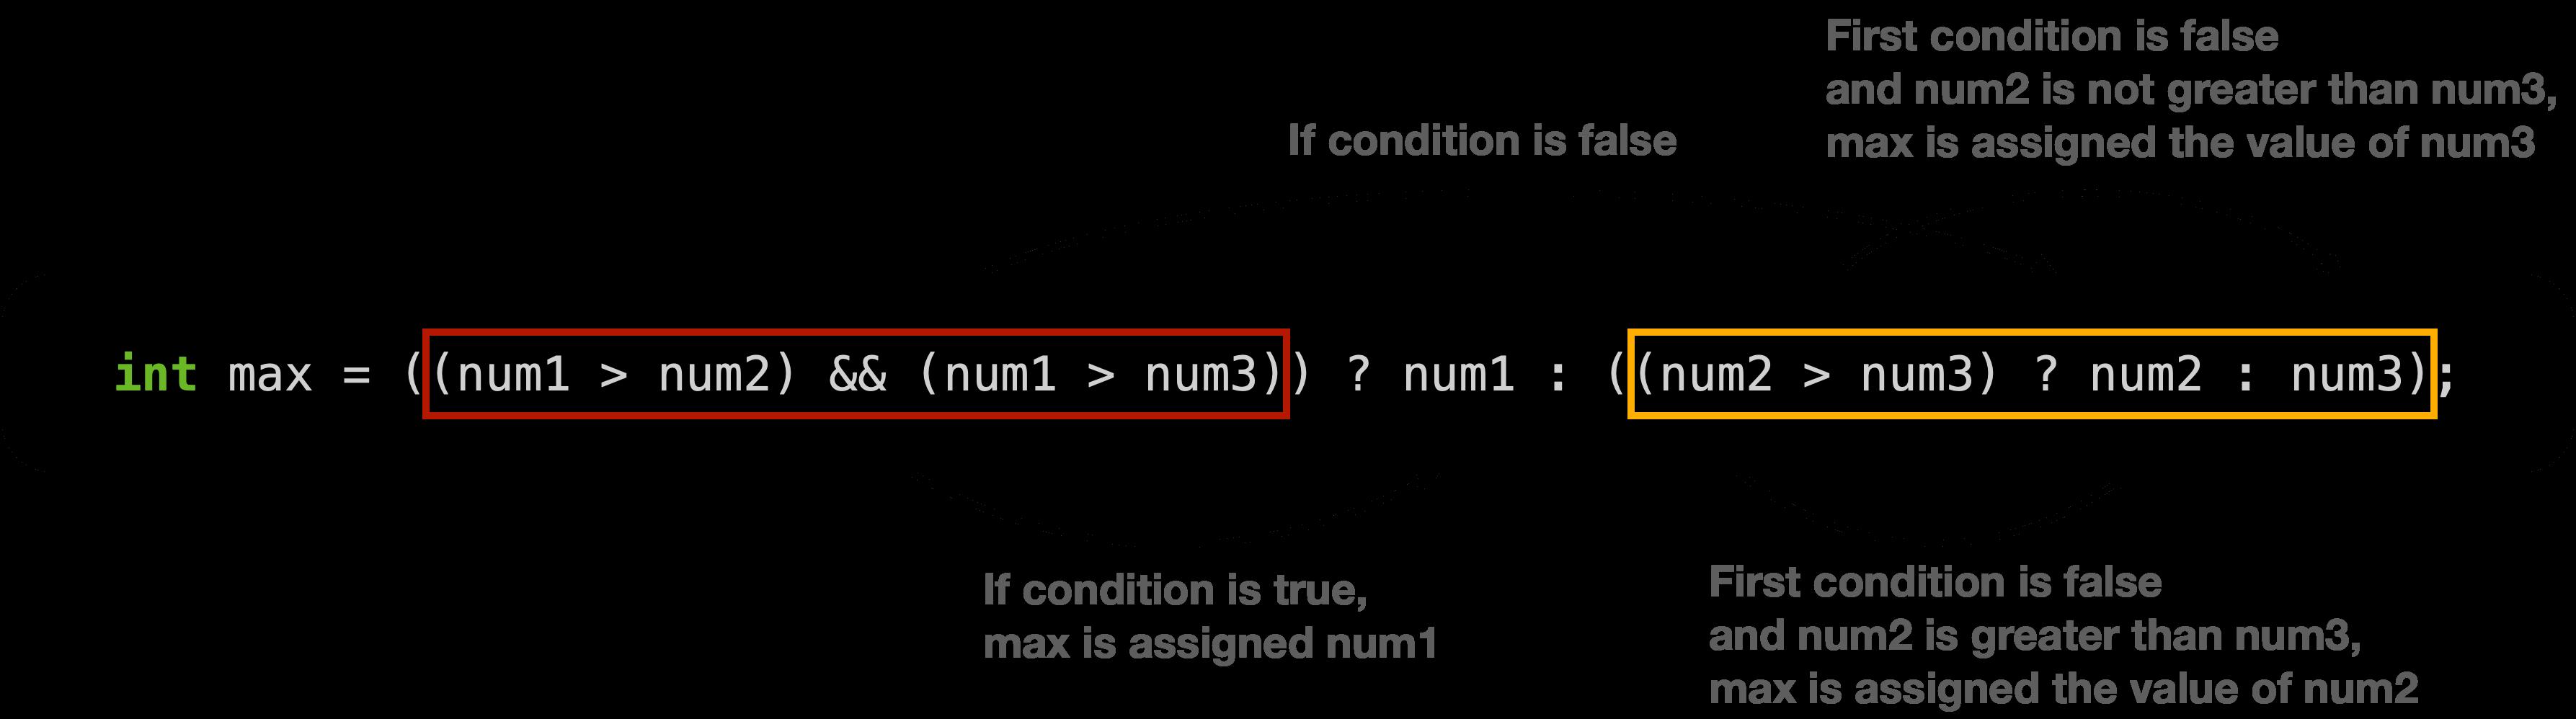 Nested ternary operator in Java